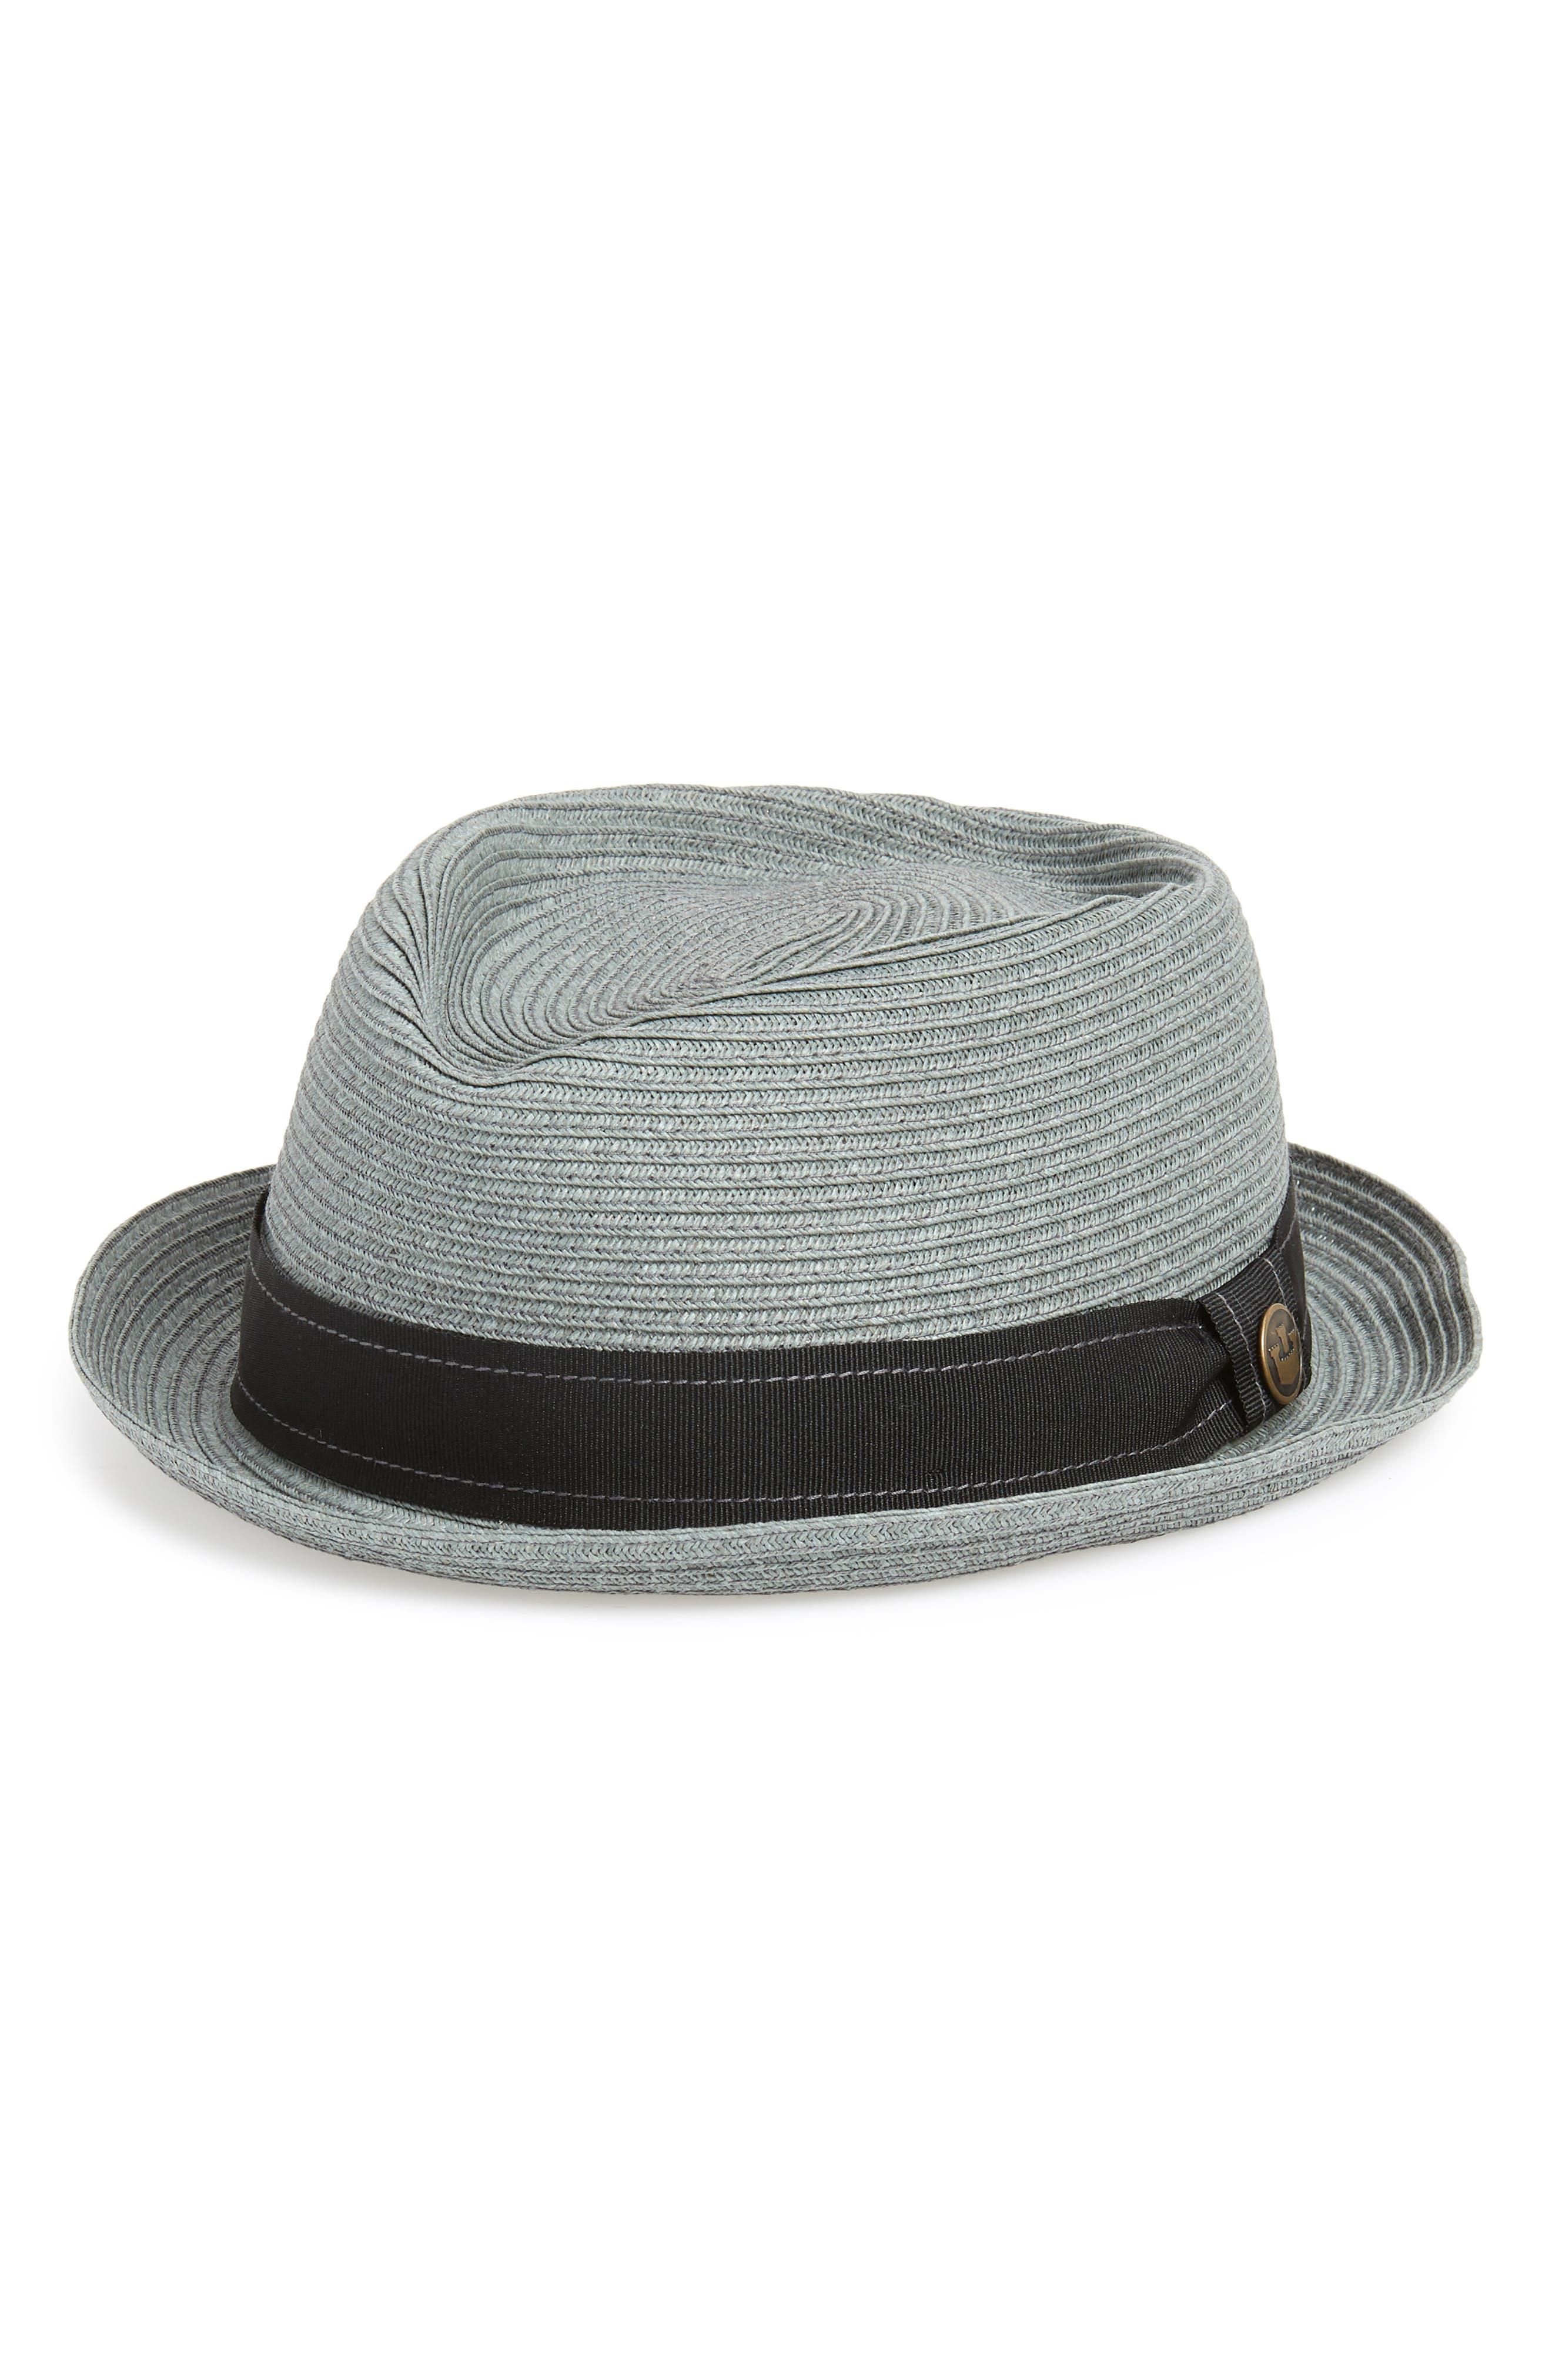 Big Joe Porkpie Hat,                             Main thumbnail 1, color,                             SAGE